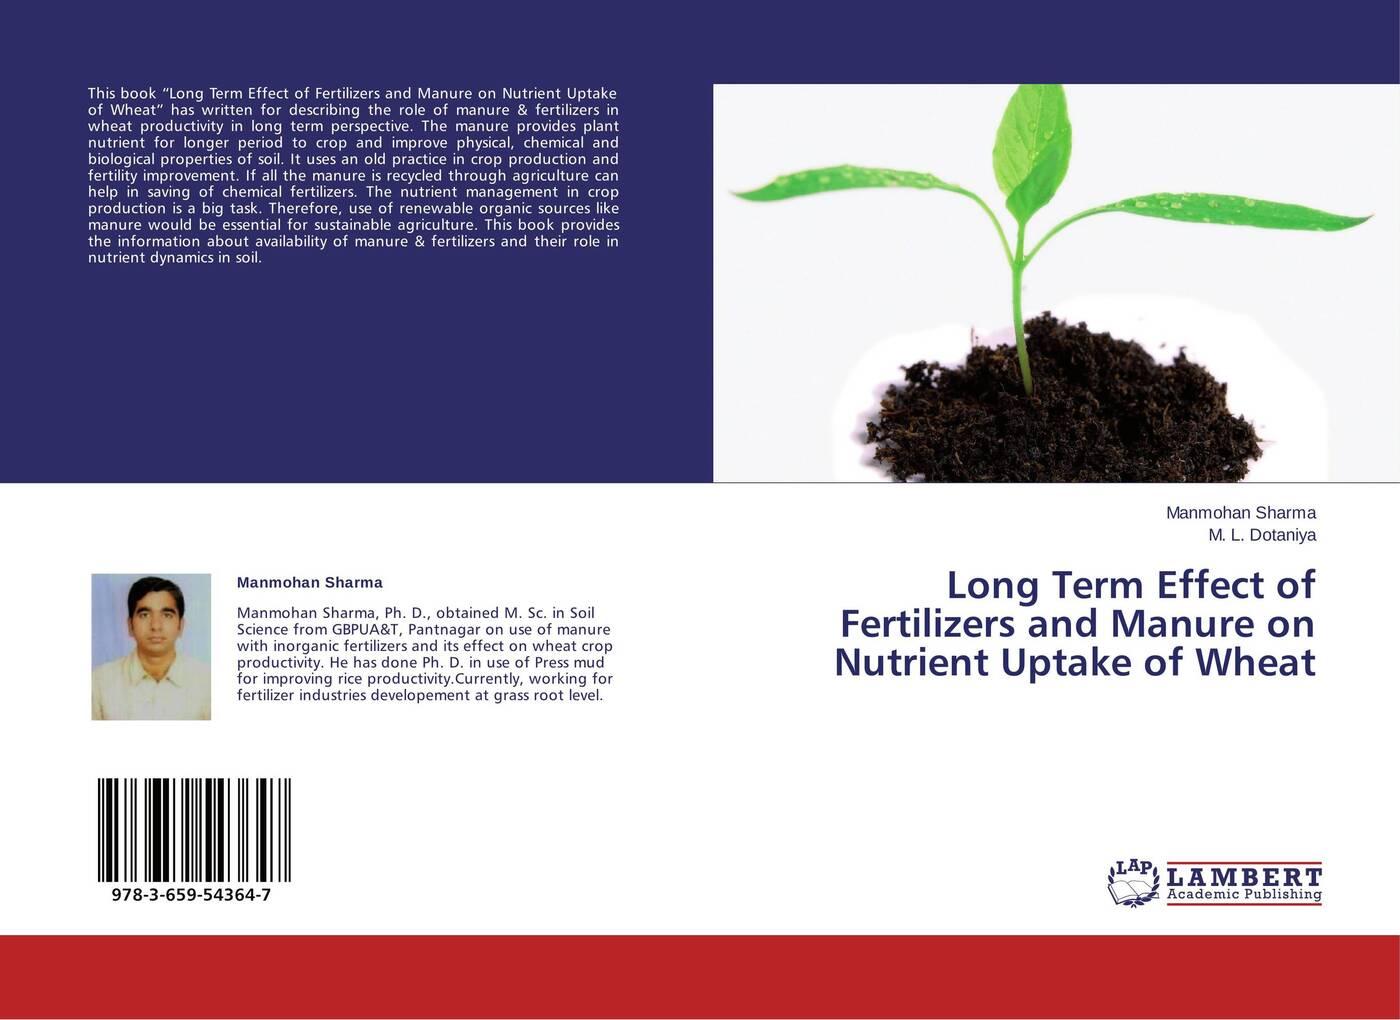 Manmohan Sharma and M. L. Dotaniya Long Term Effect of Fertilizers and Manure on Nutrient Uptake of Wheat pragnesh dave and jaspal b sukhdiya preparation of chitosan nanoparticals coated k fertilizers